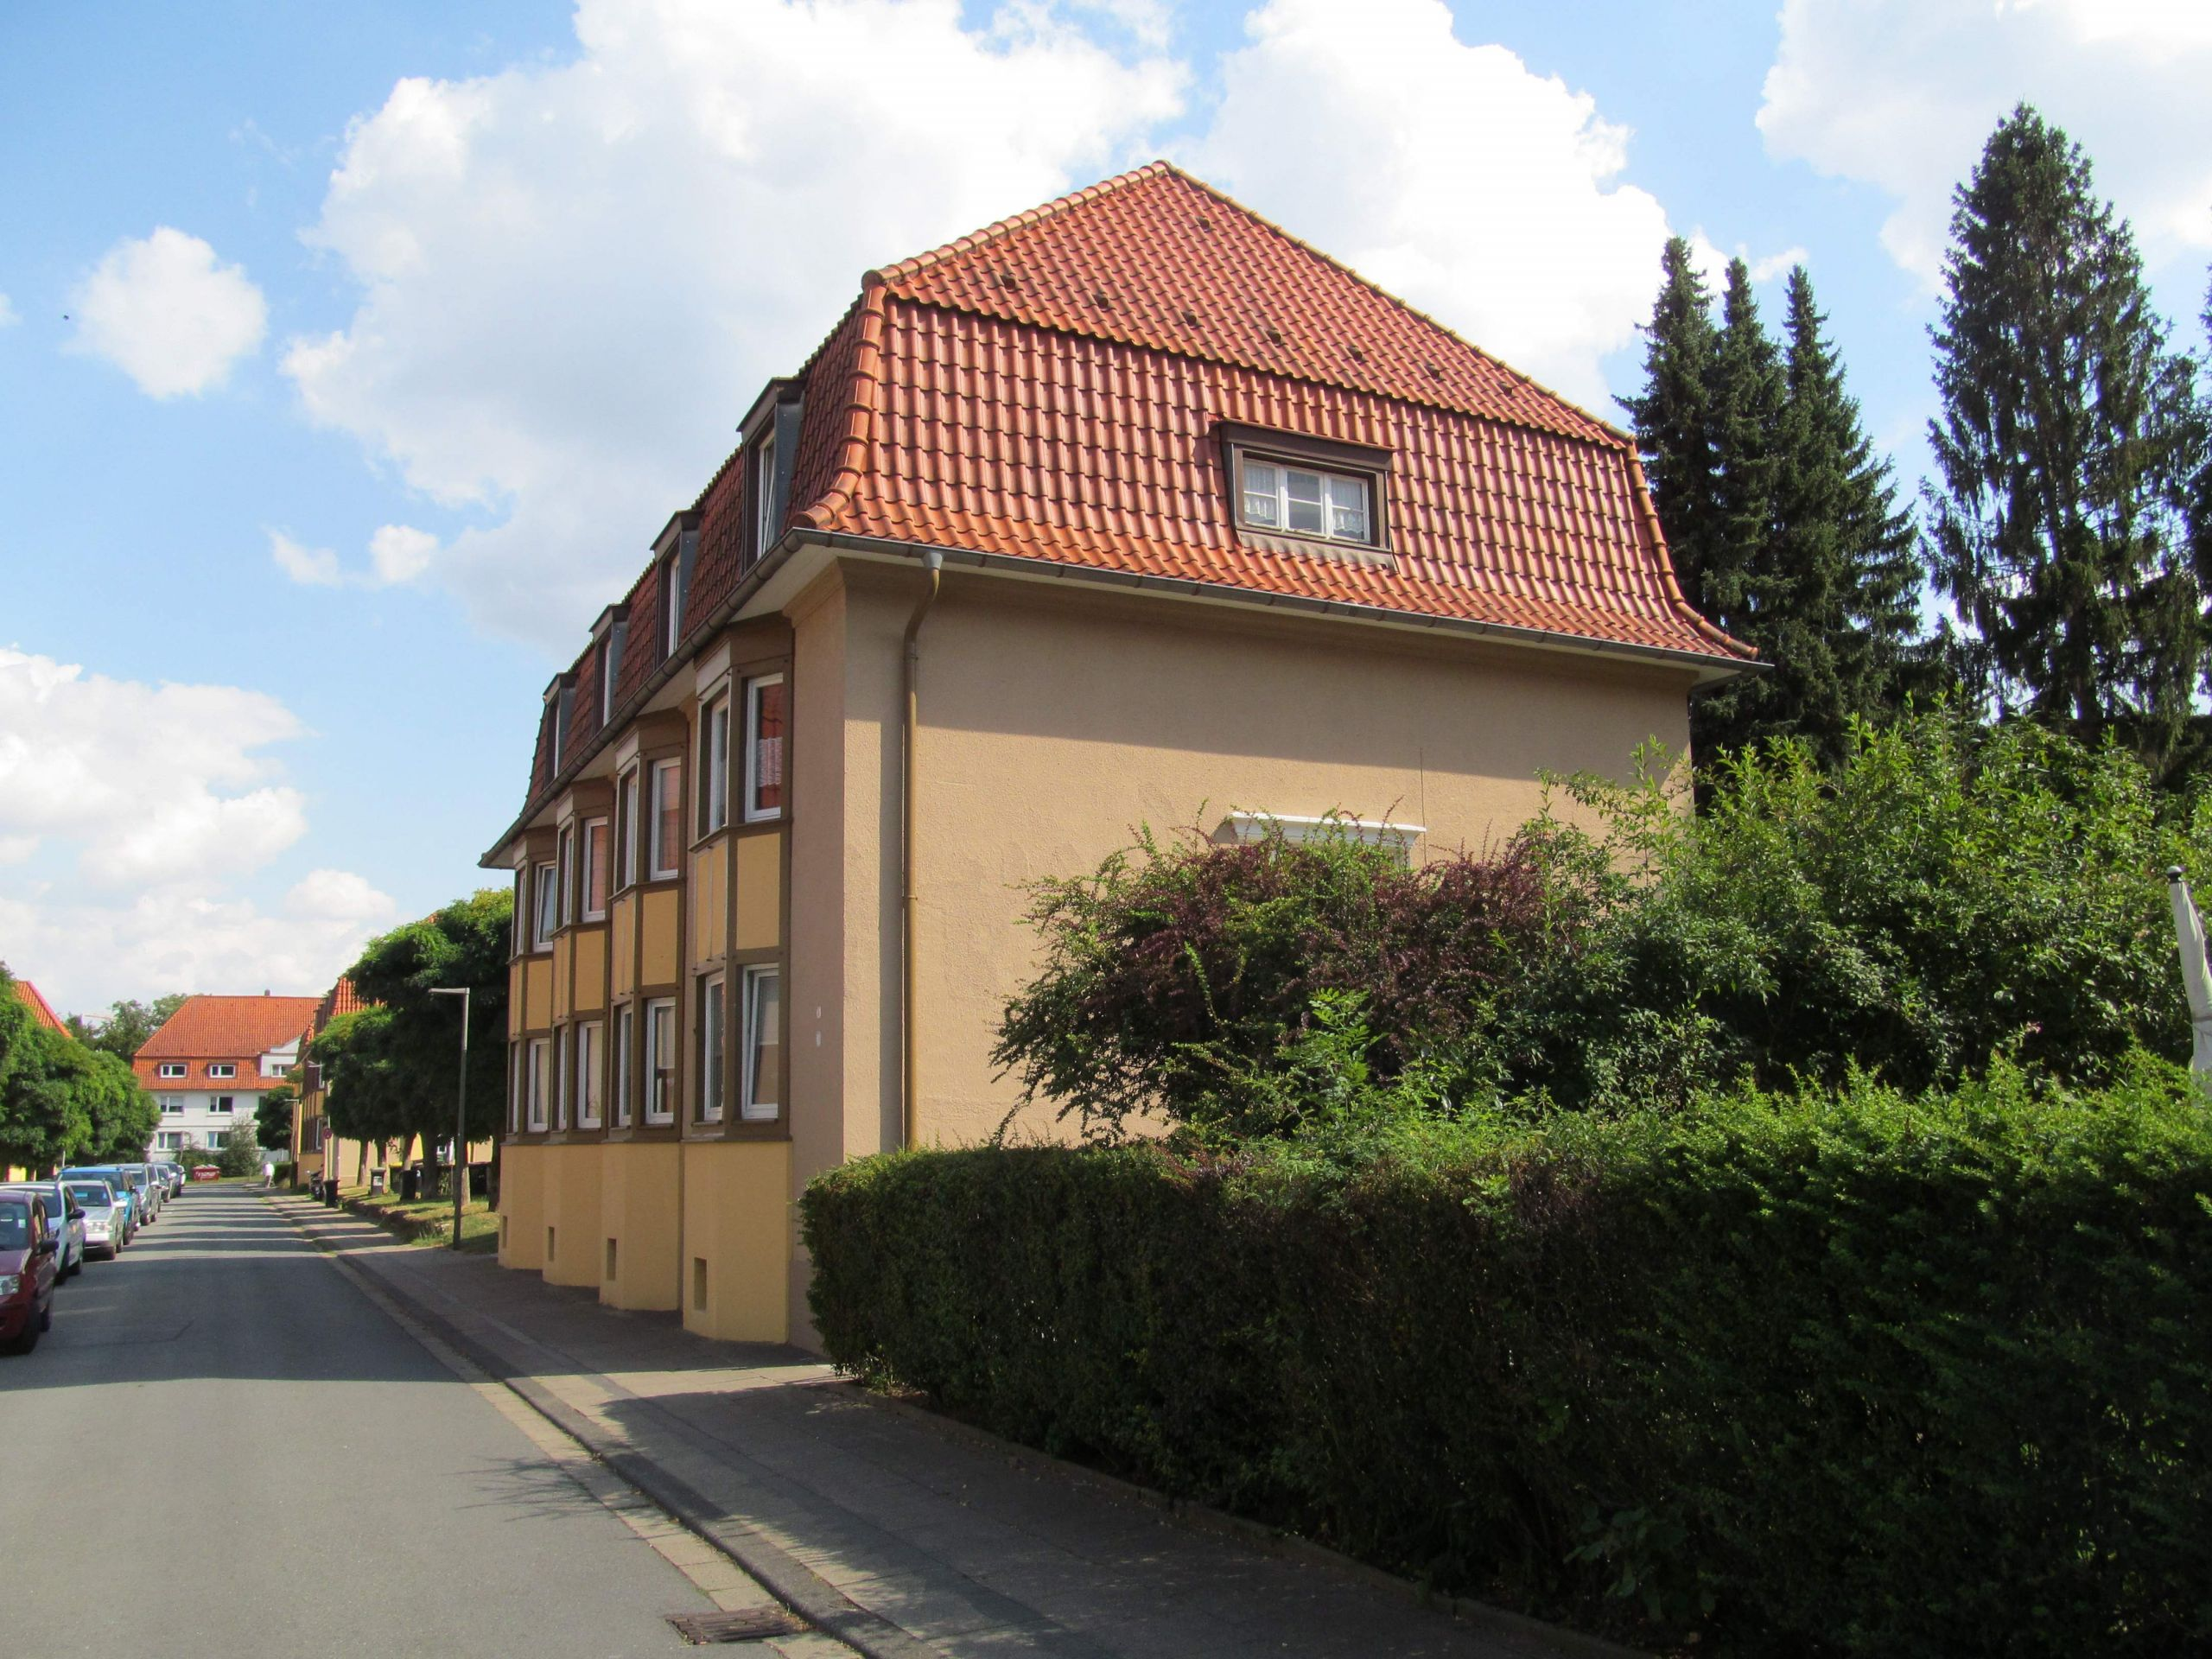 Bromberger Straße 6 4 1 Mitte Bielefeld